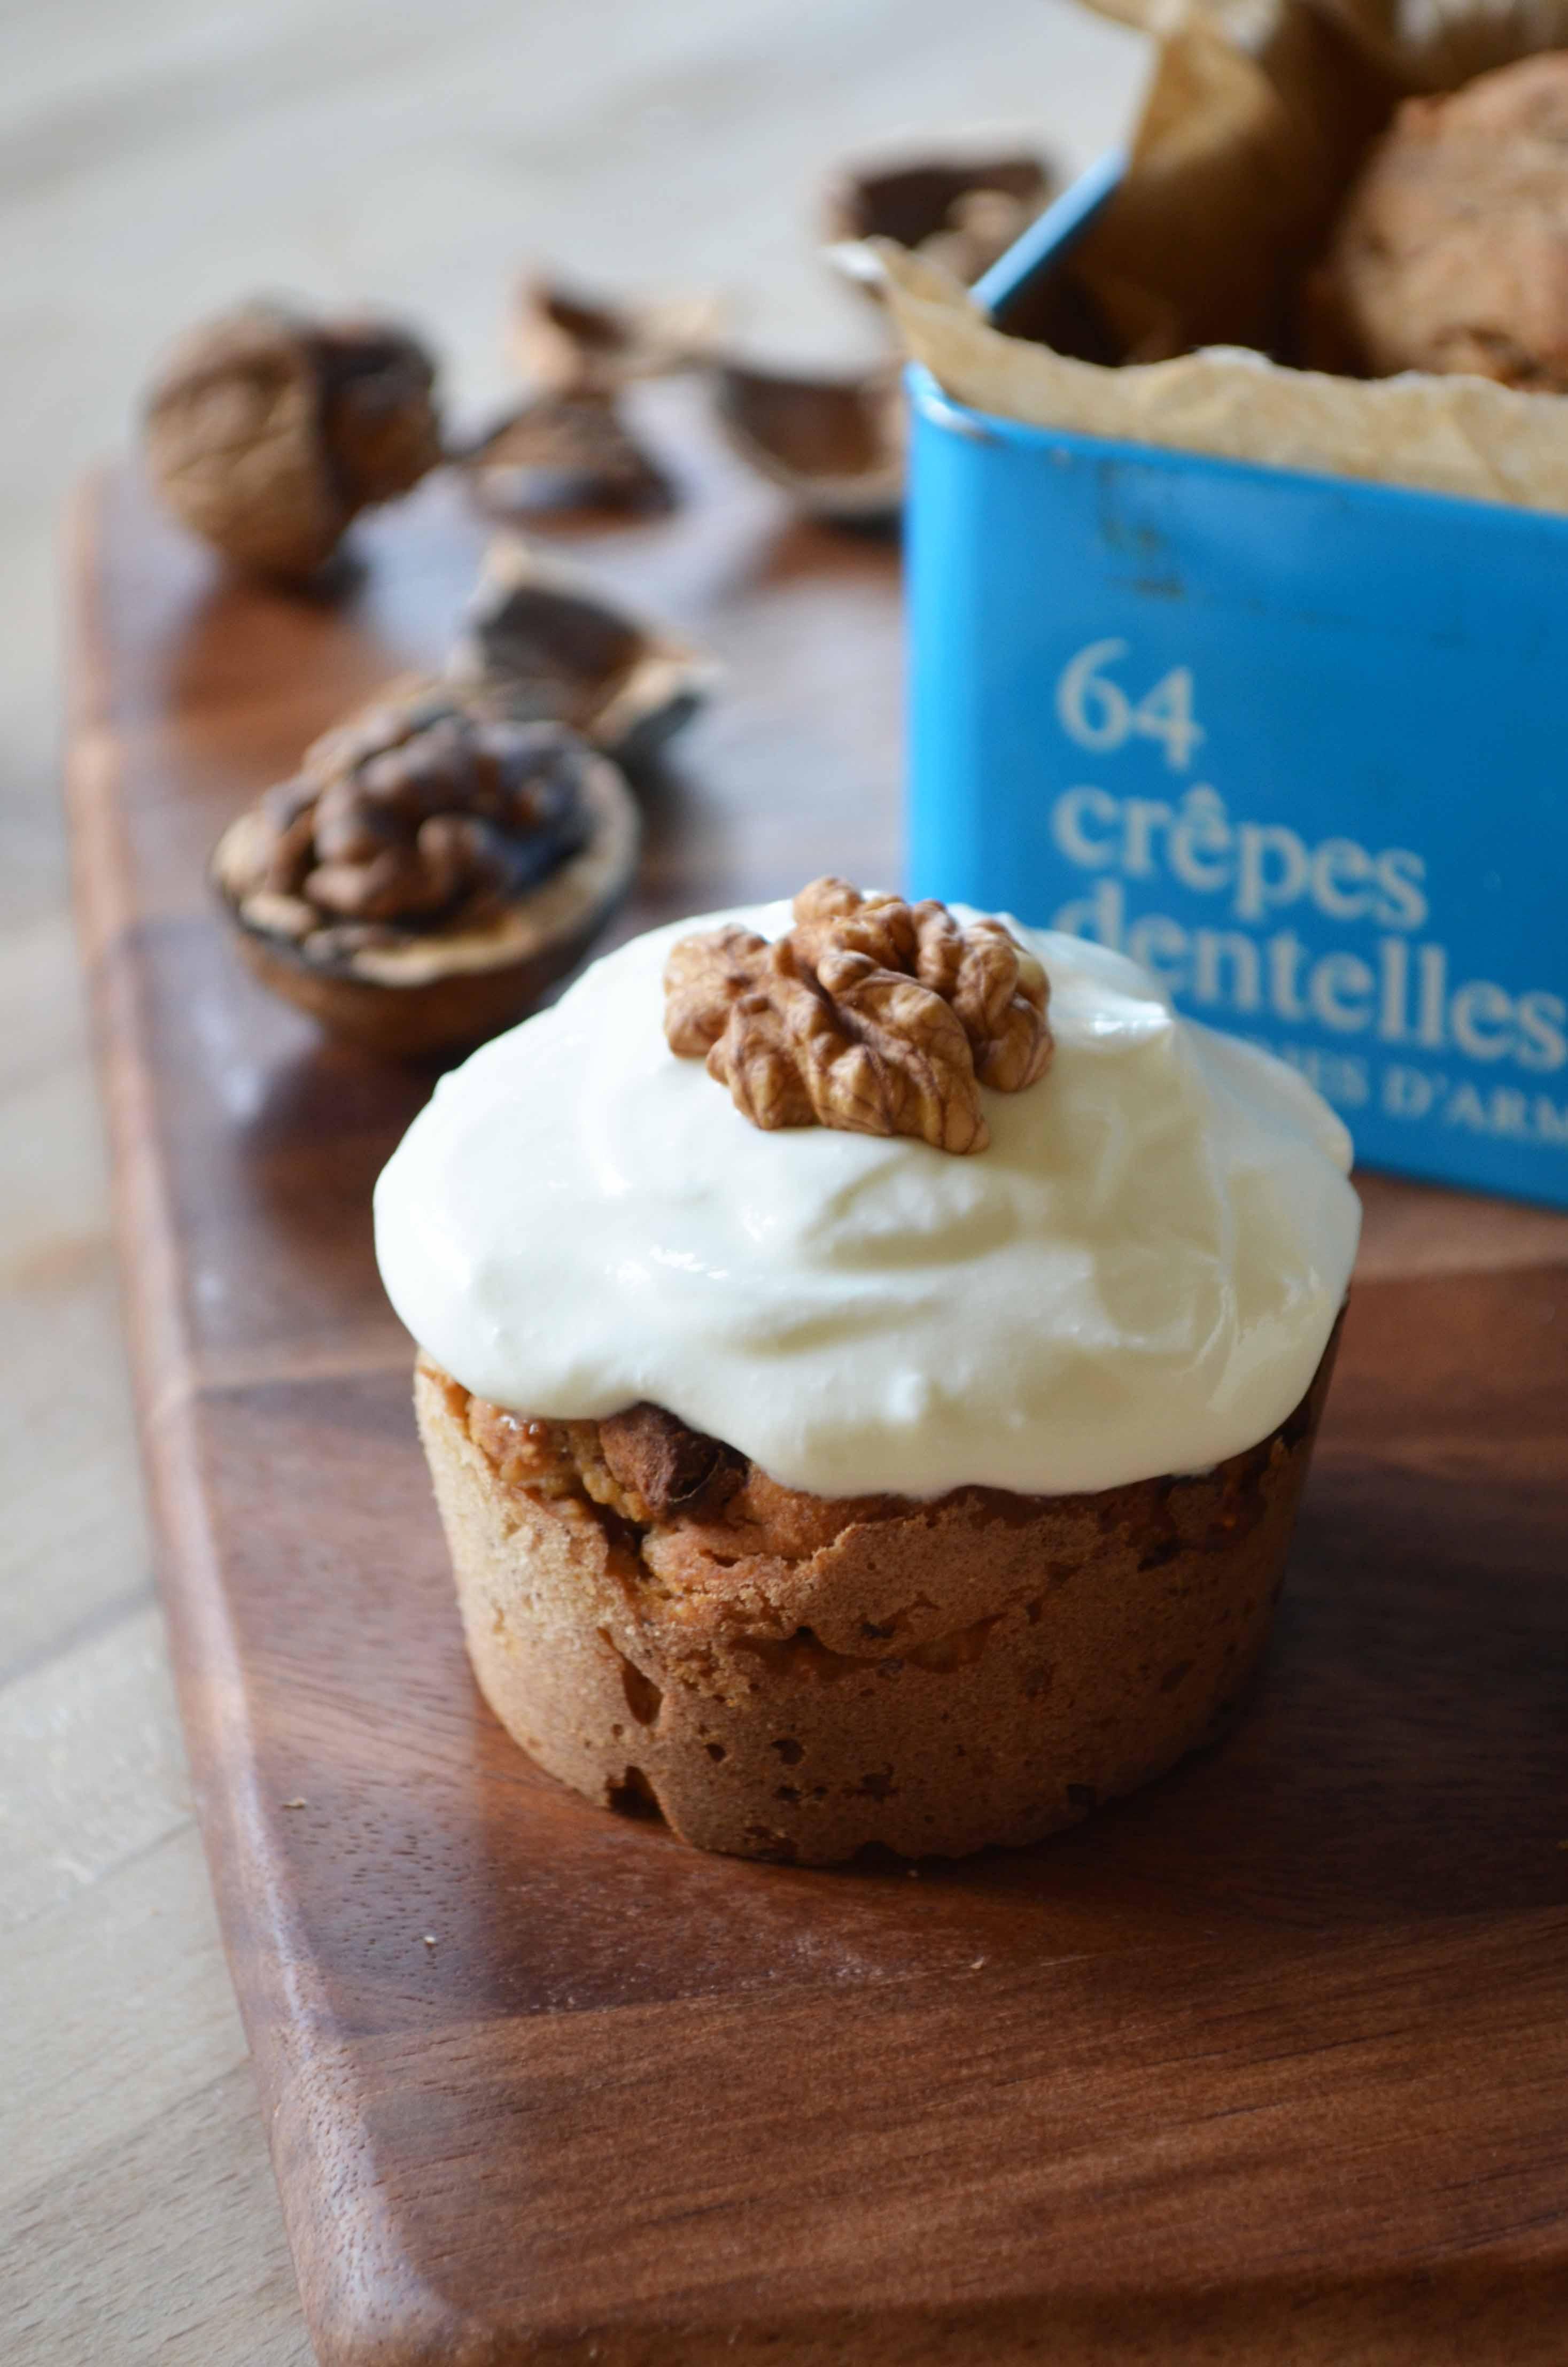 Apple Muffins with Walnuts, Cinnamon and Zante Currants